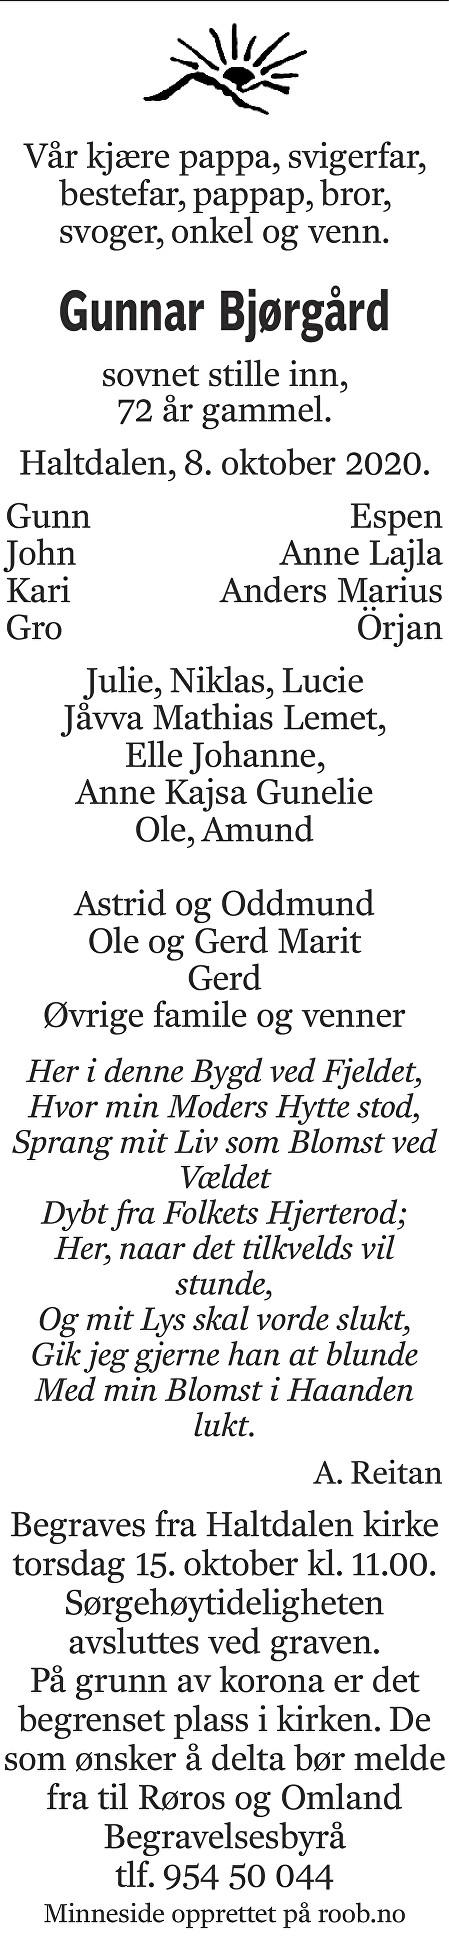 Gunnar Bjørgård Dødsannonse